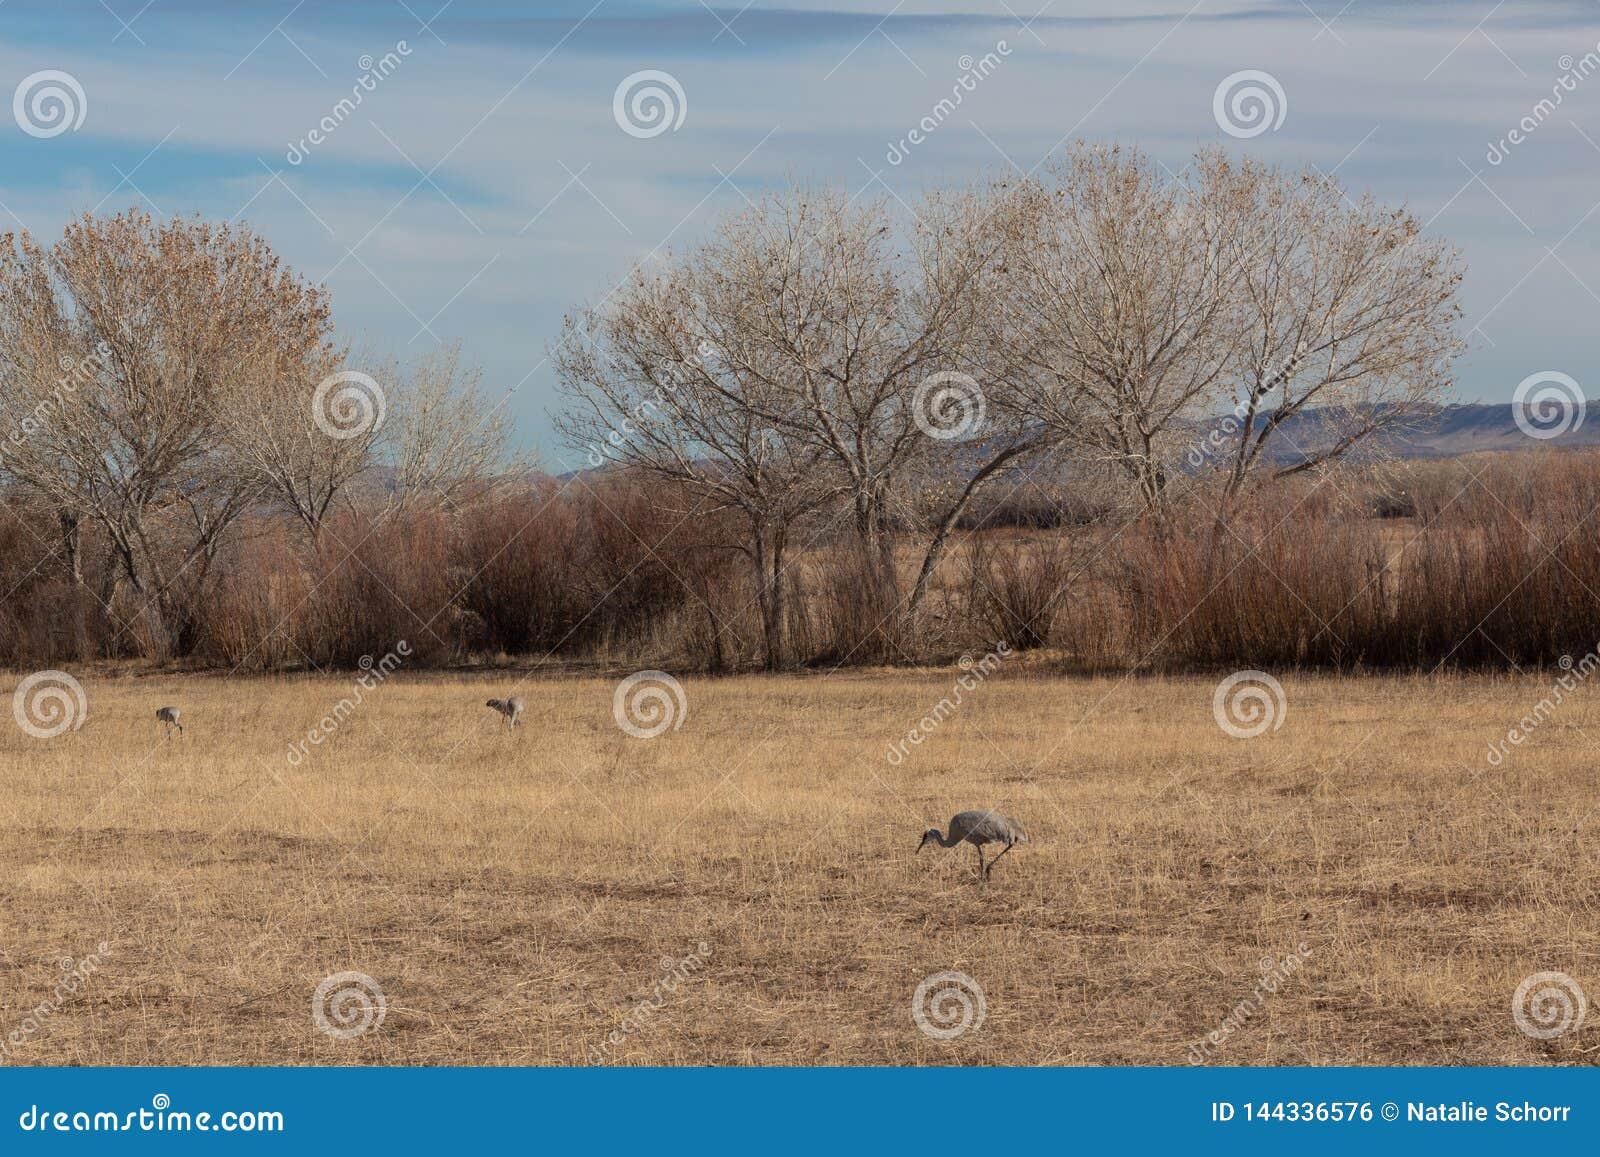 Bosque del Apache New Mexico, Sandhill cranes Antigone canadensis in field before cottonwoods and tall grasses